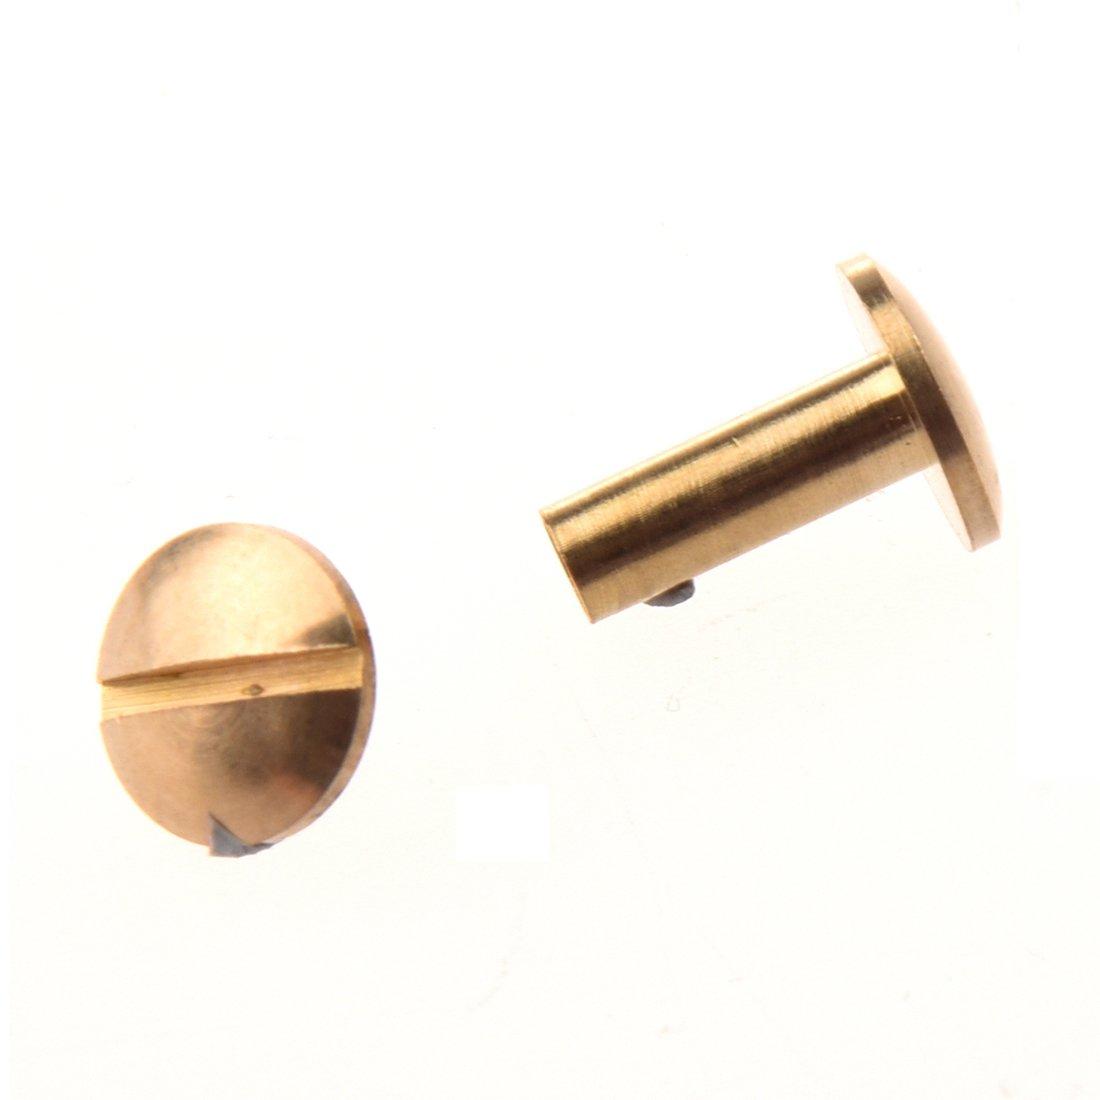 Cikuso 10x Perno del Boton Macizo de Laton de Arco Clavos de Tornillo Tornillo de Vuelta Cinturon de Cuero del Remache 6mm